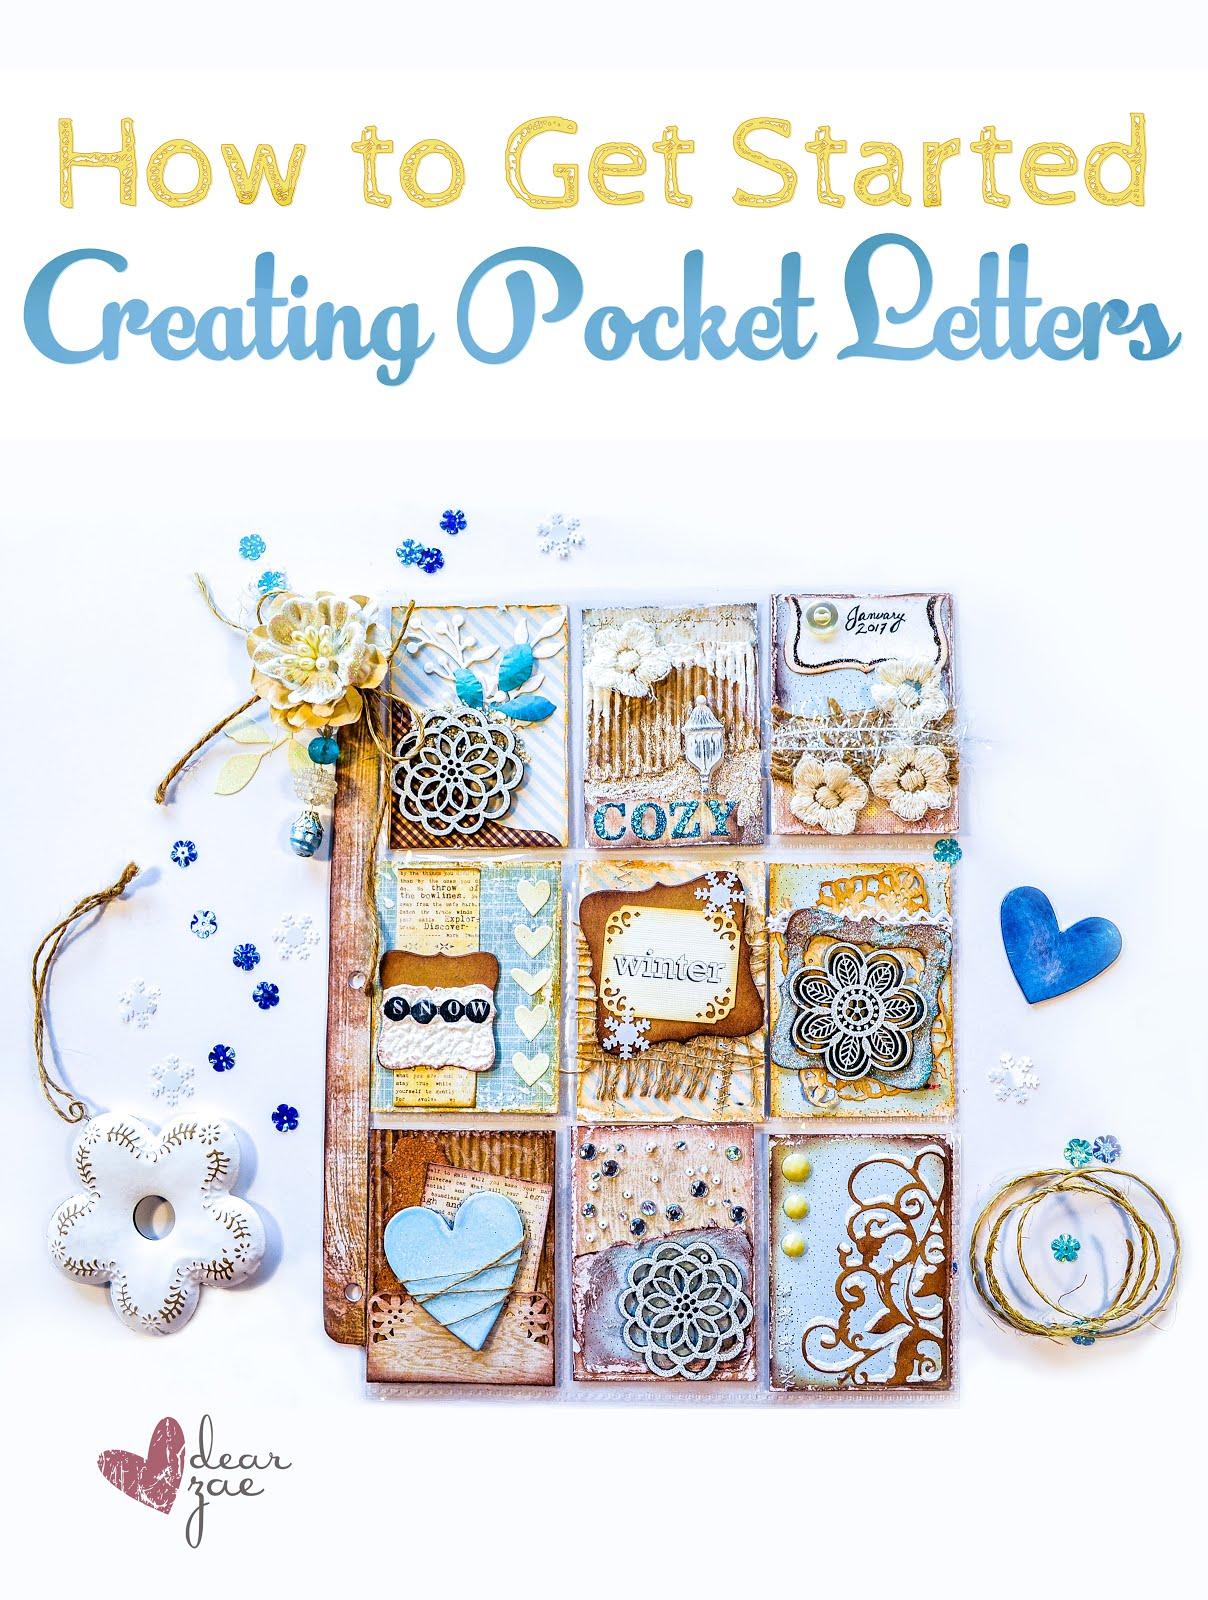 Pocket Letter tutorial